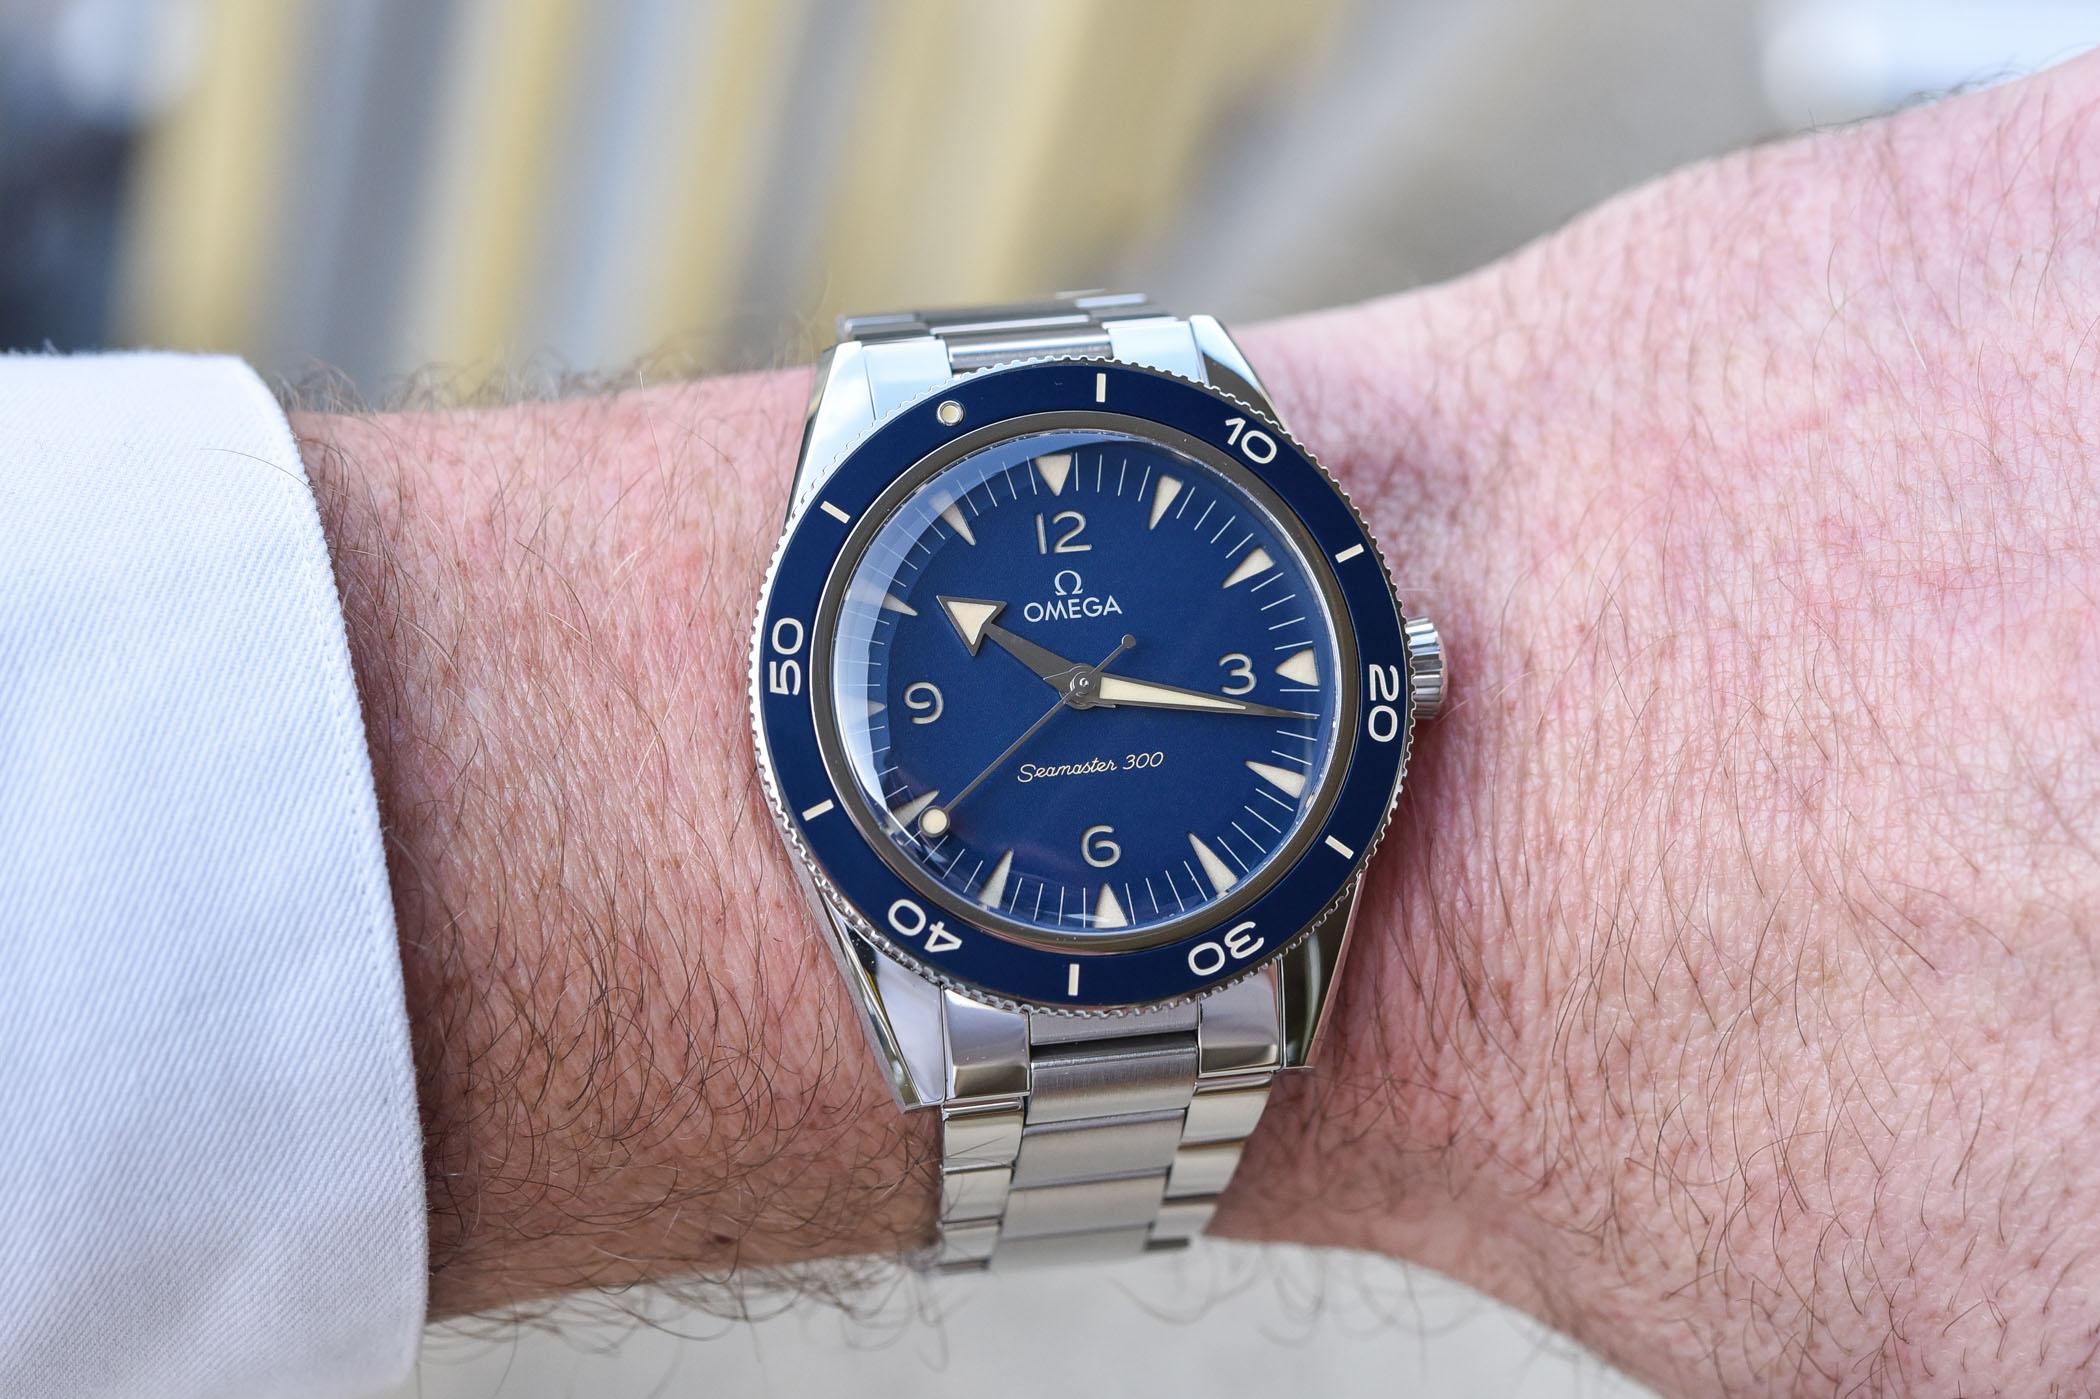 2021 Omega Seamaster 300 steel blue dial 234.30.41.21.03.001